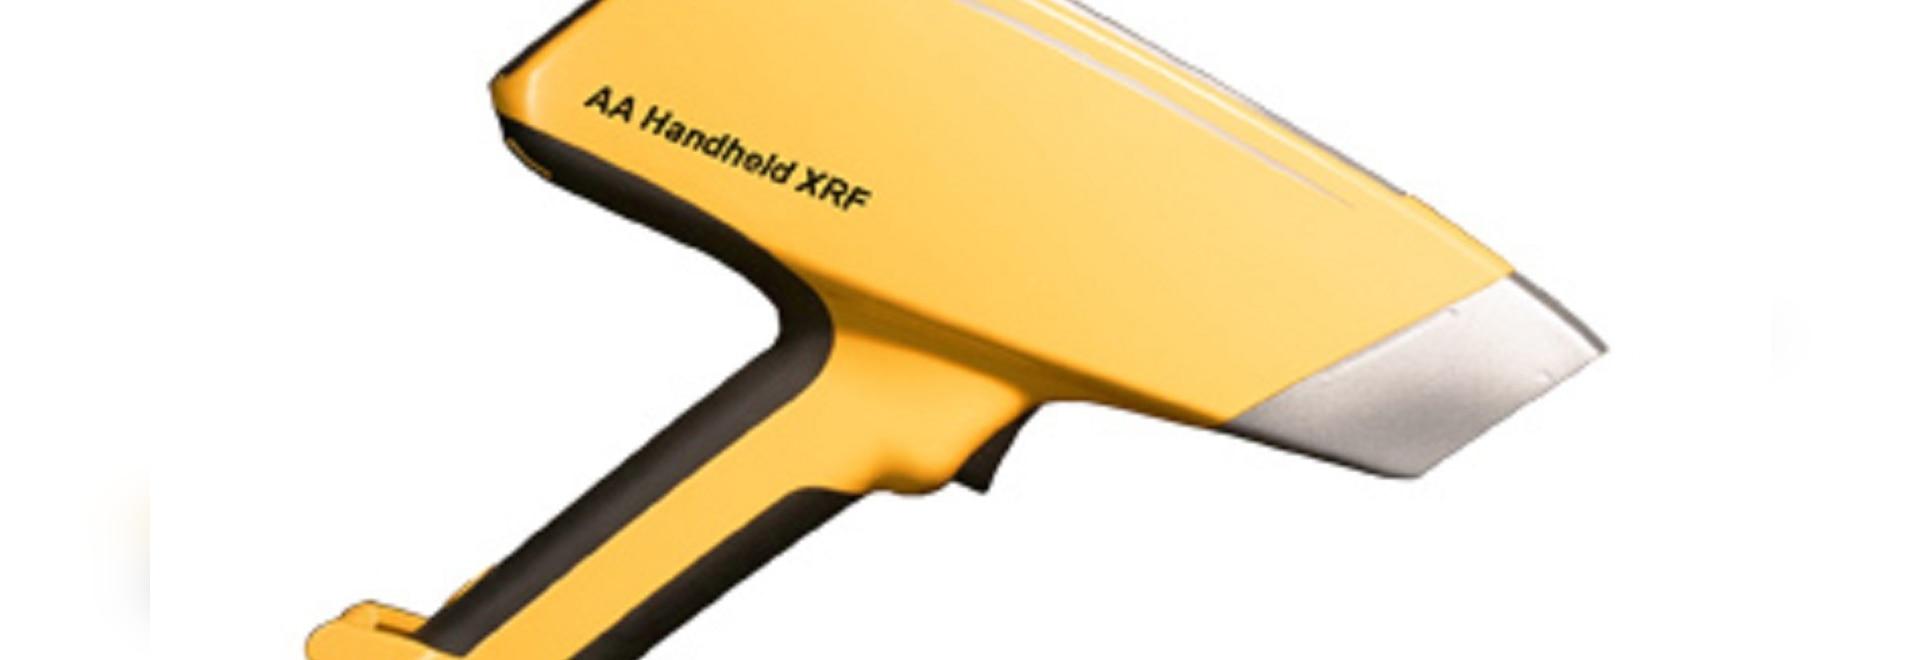 Handheld XRF